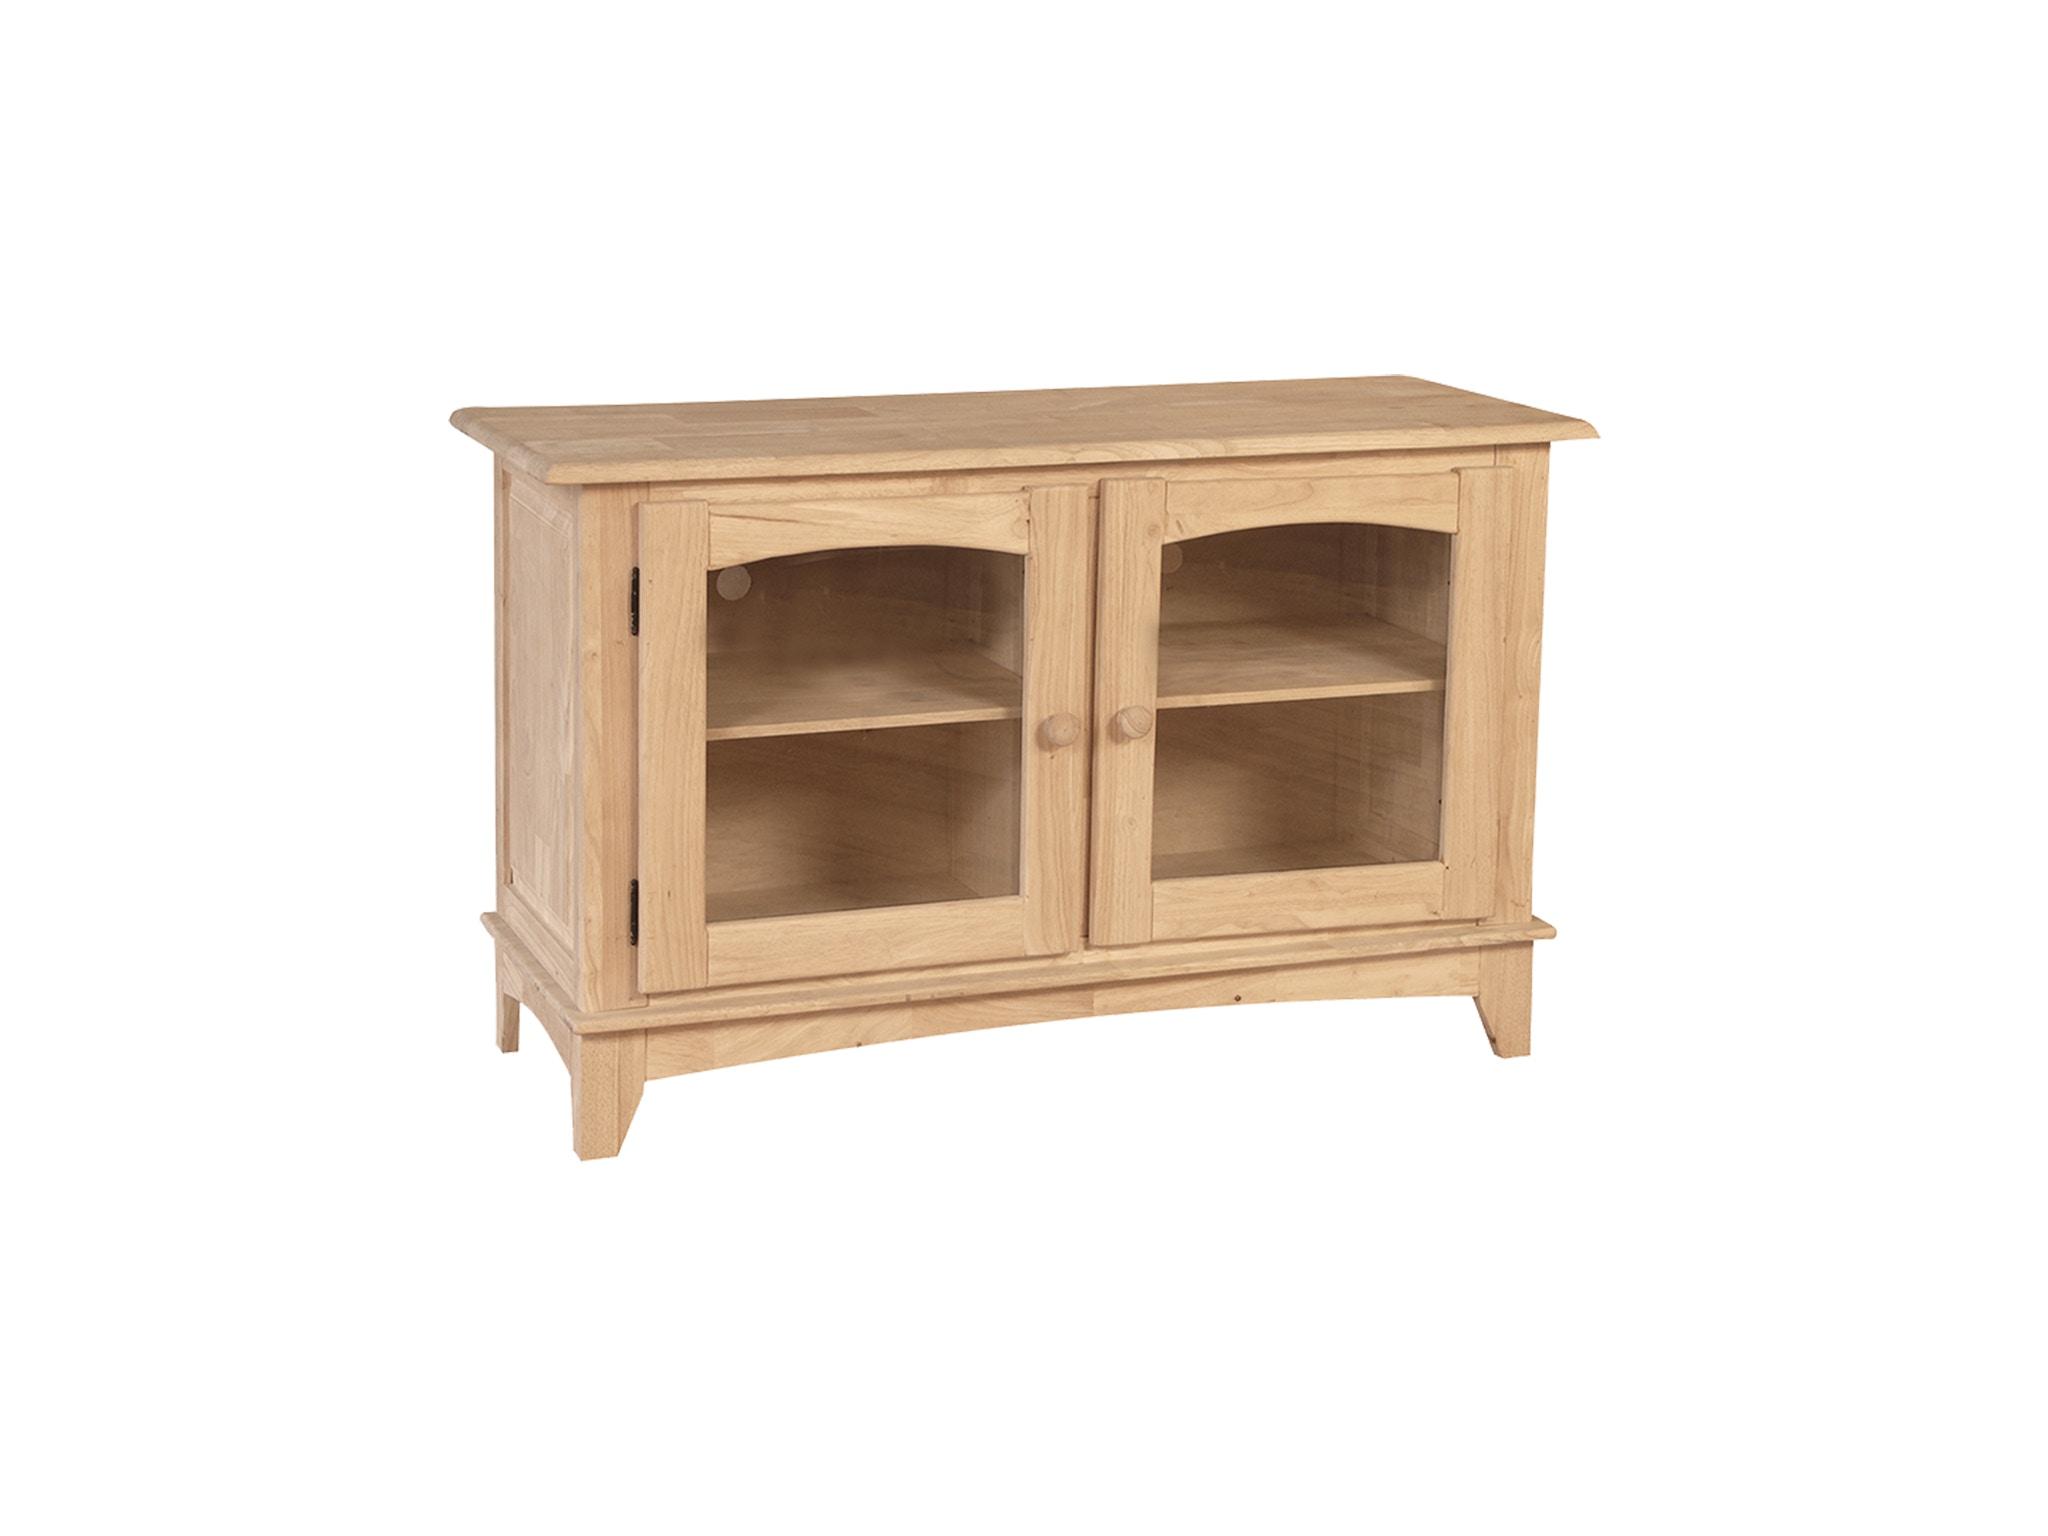 John Thomas Home Entertainment 2-Door Entertainment Center<br><br>Two adjustable shelves